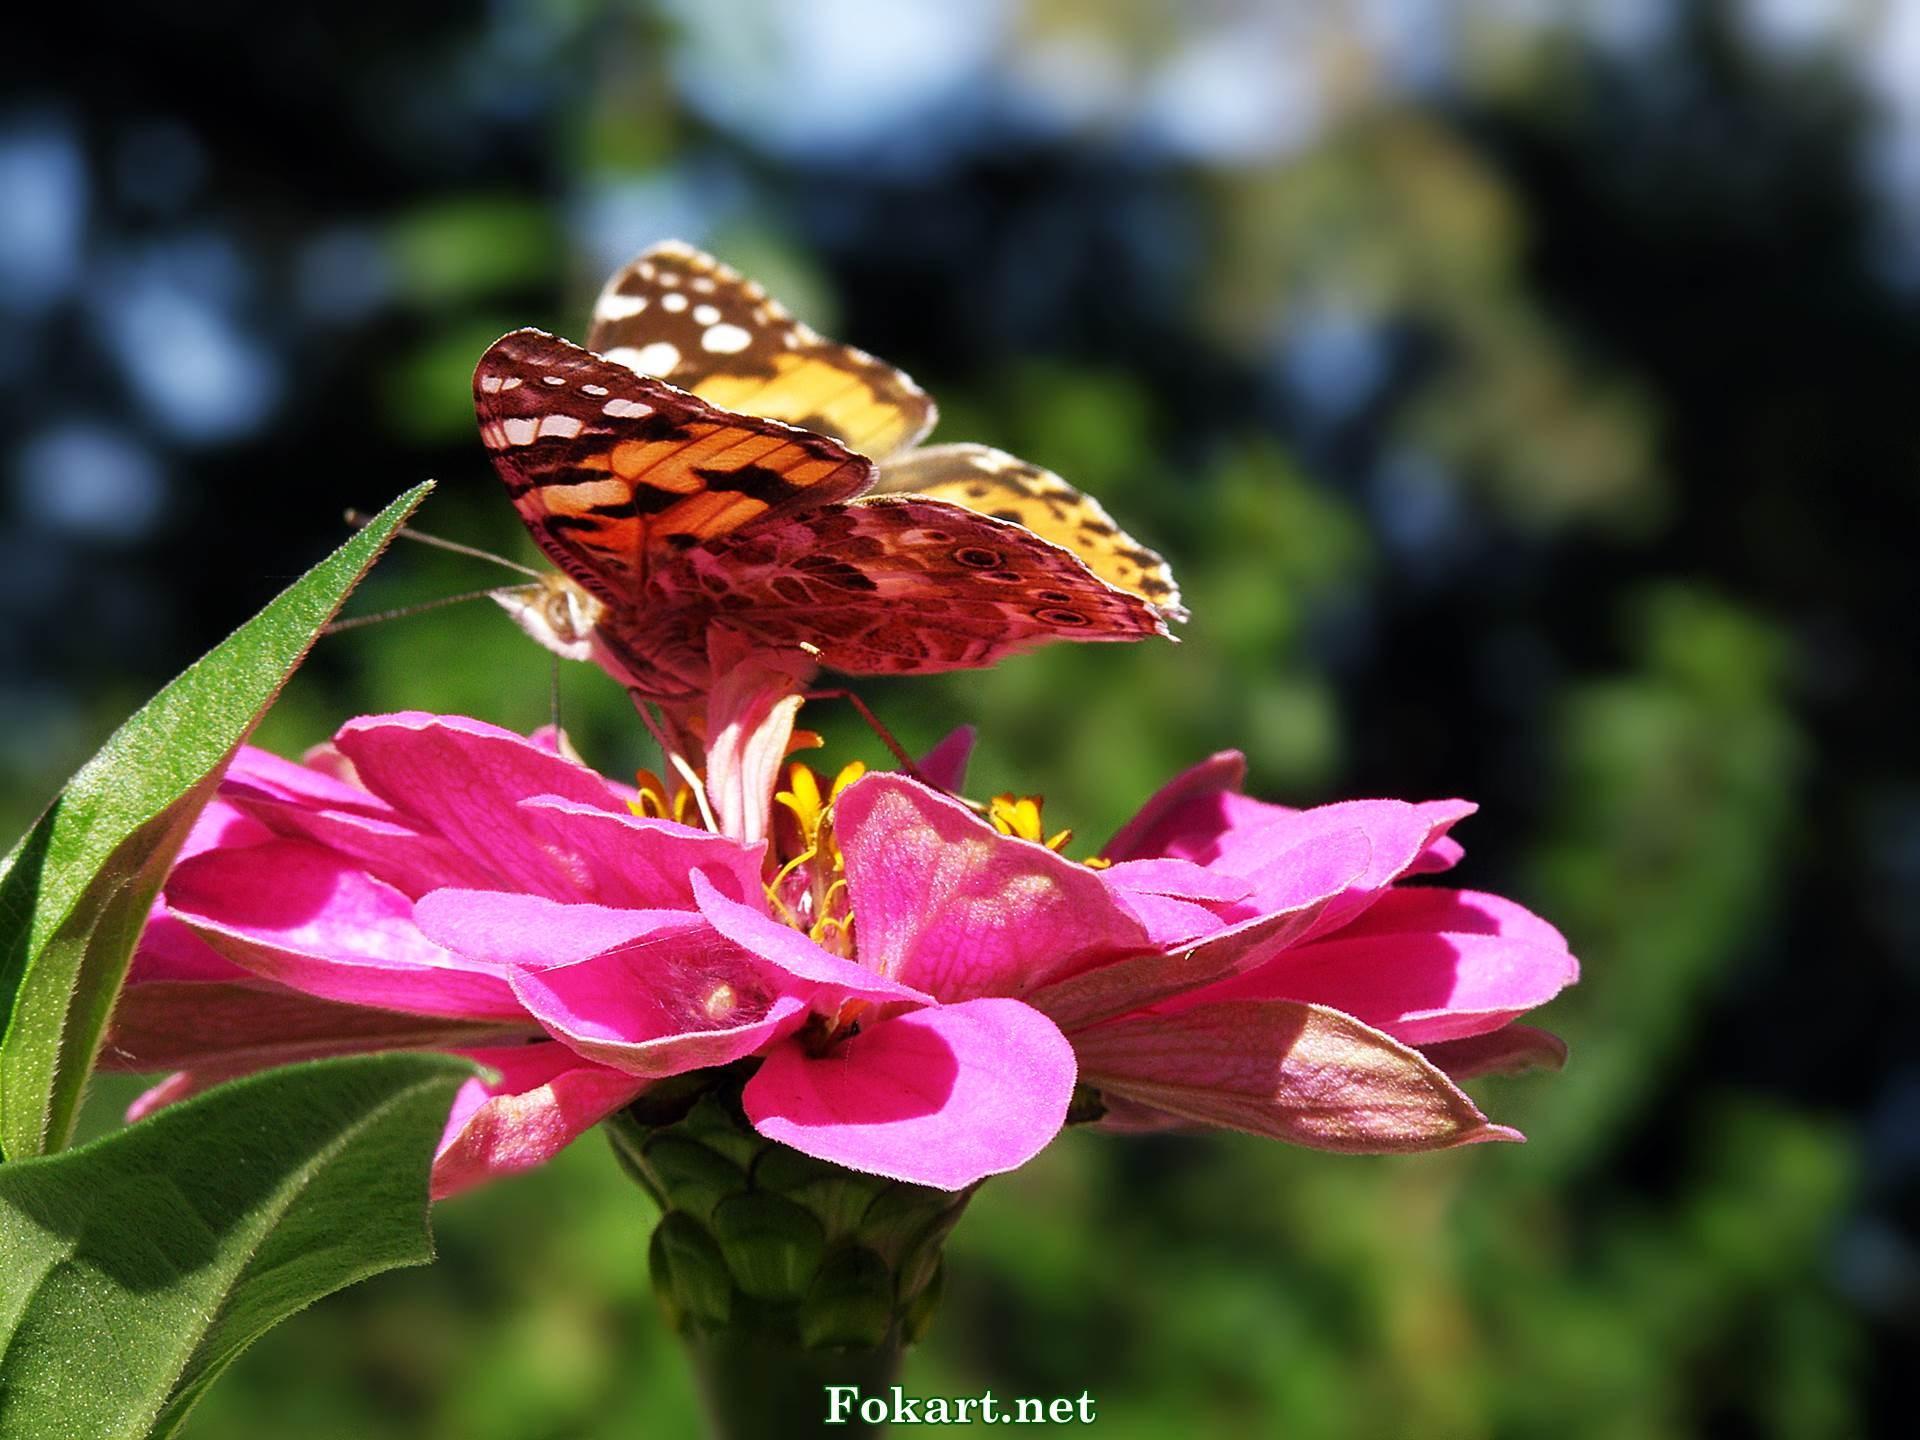 Перламутровка на розовом цветке циннии